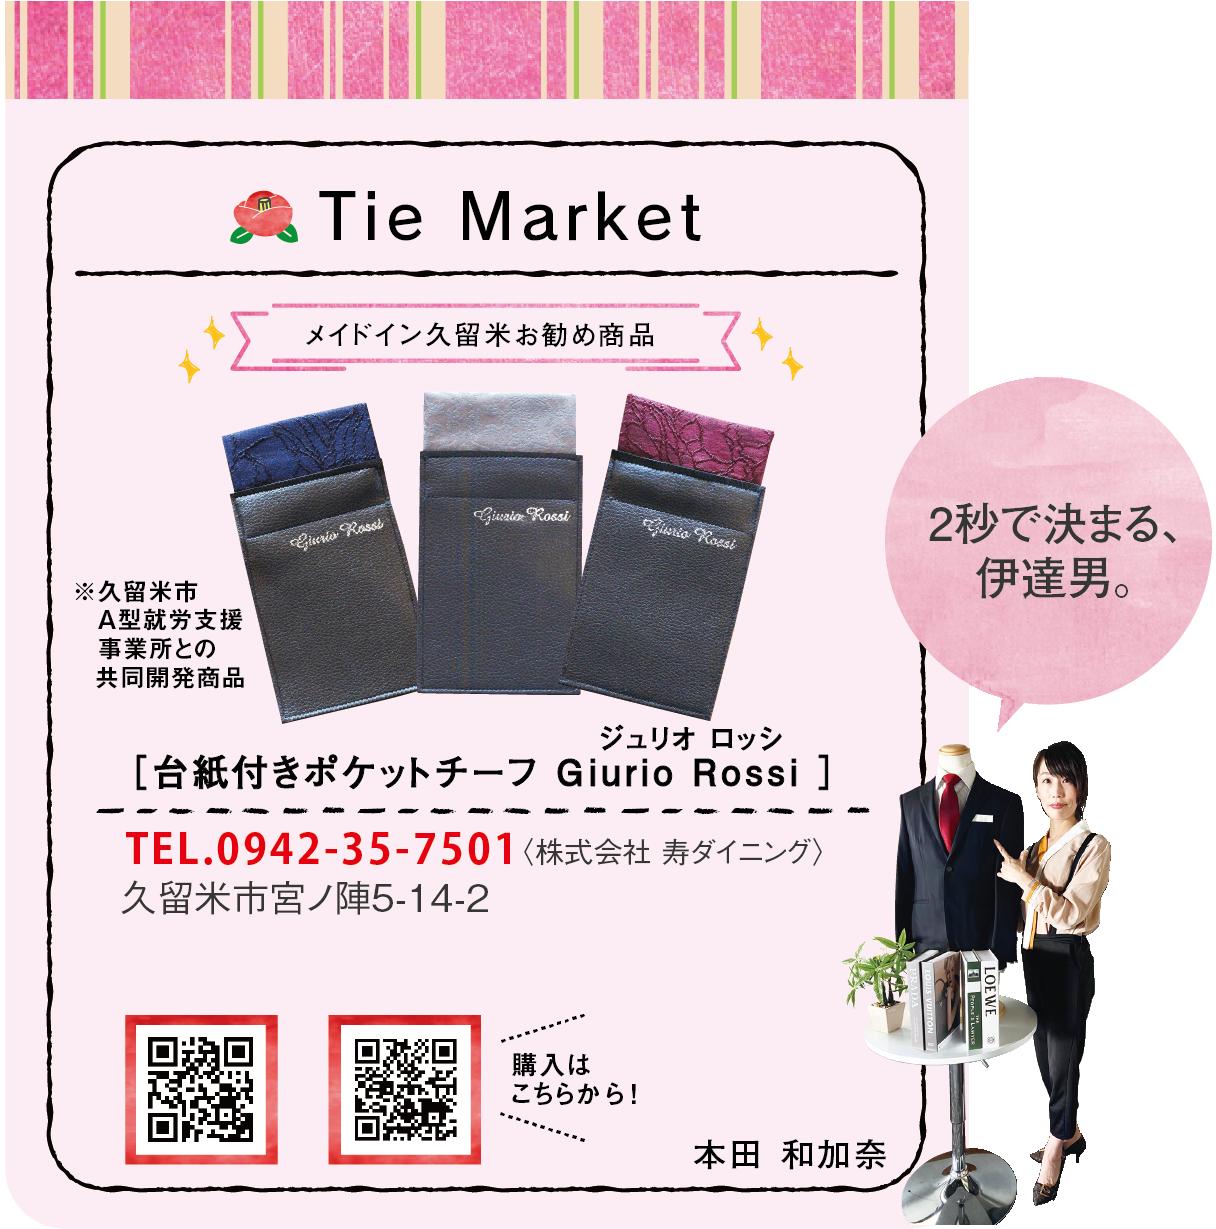 Tie Market